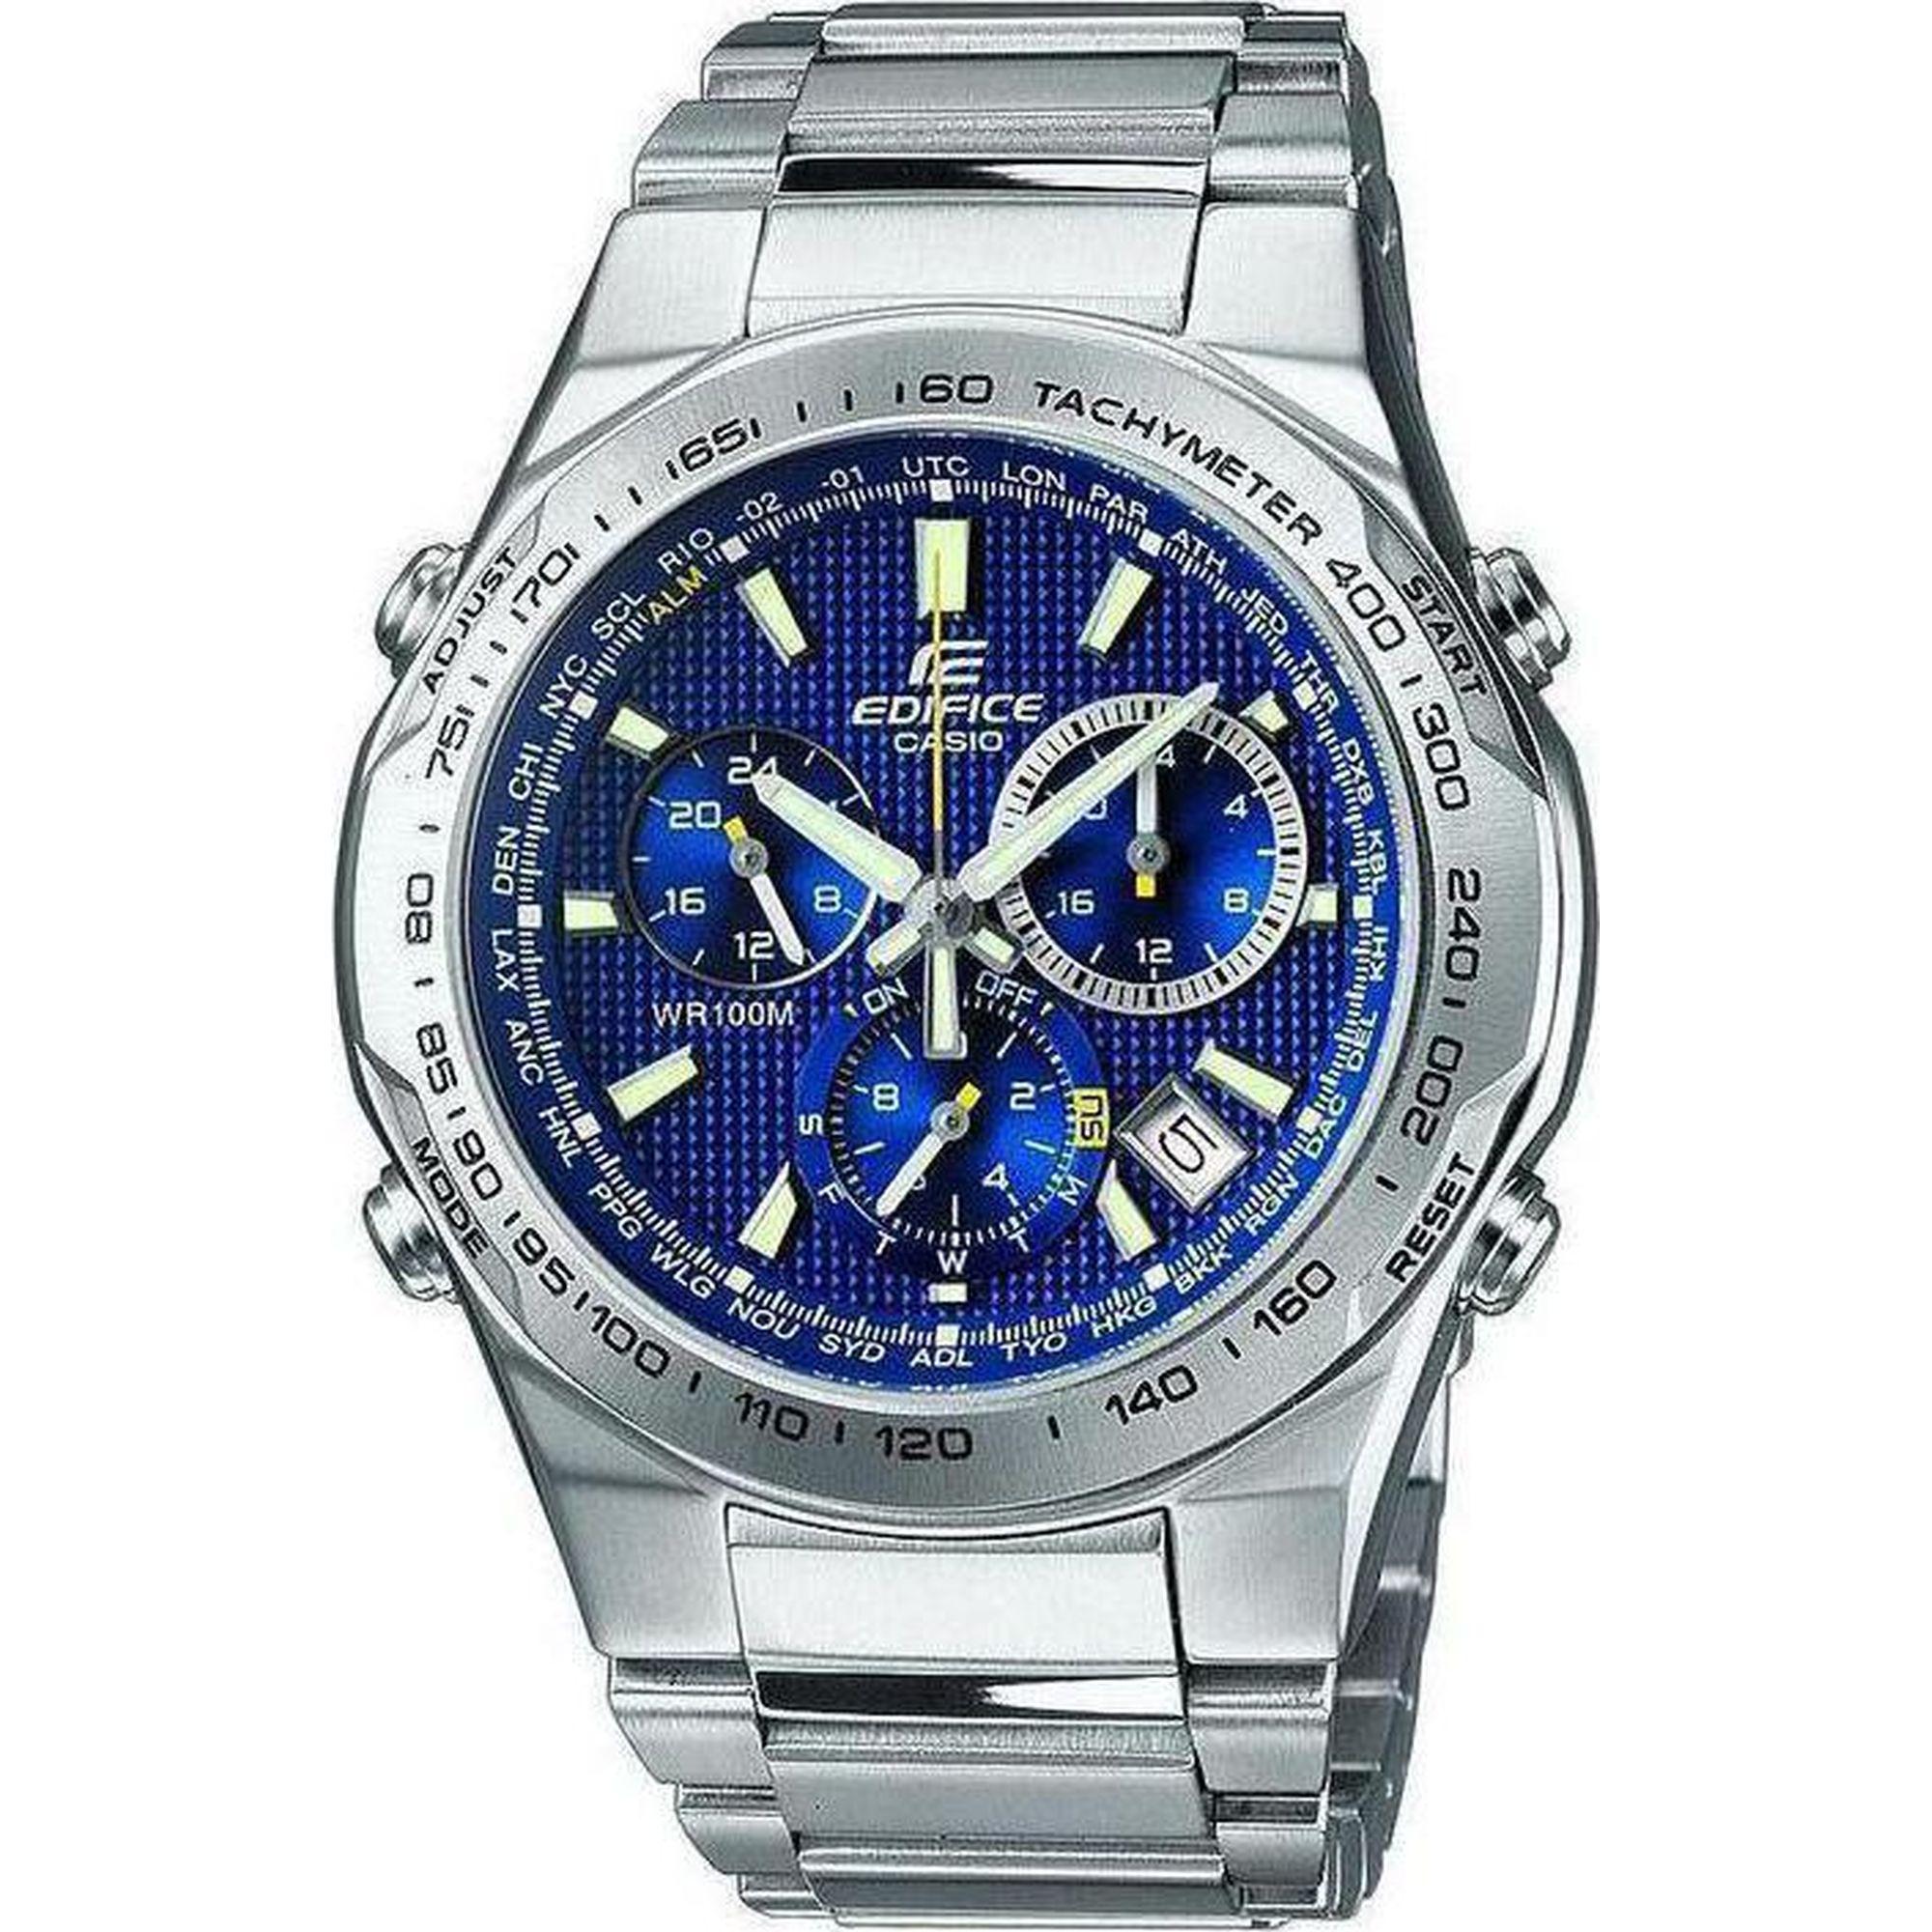 Casio Edifice 50mm Μπλέ/Ασημί Μπρασελέ Casio EF-528D-2AVEF, ρολόι, ανδρικό ρολόι, Casio, Casio ρολόι, δωρεάν μεταφορικά, άμεση διαθεσιμότητα